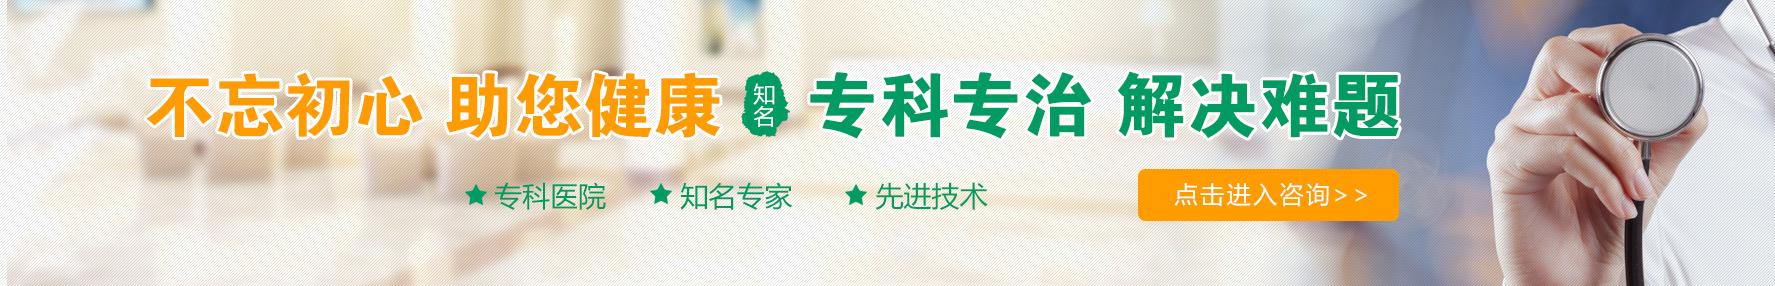 徐州医疗美容医院banner